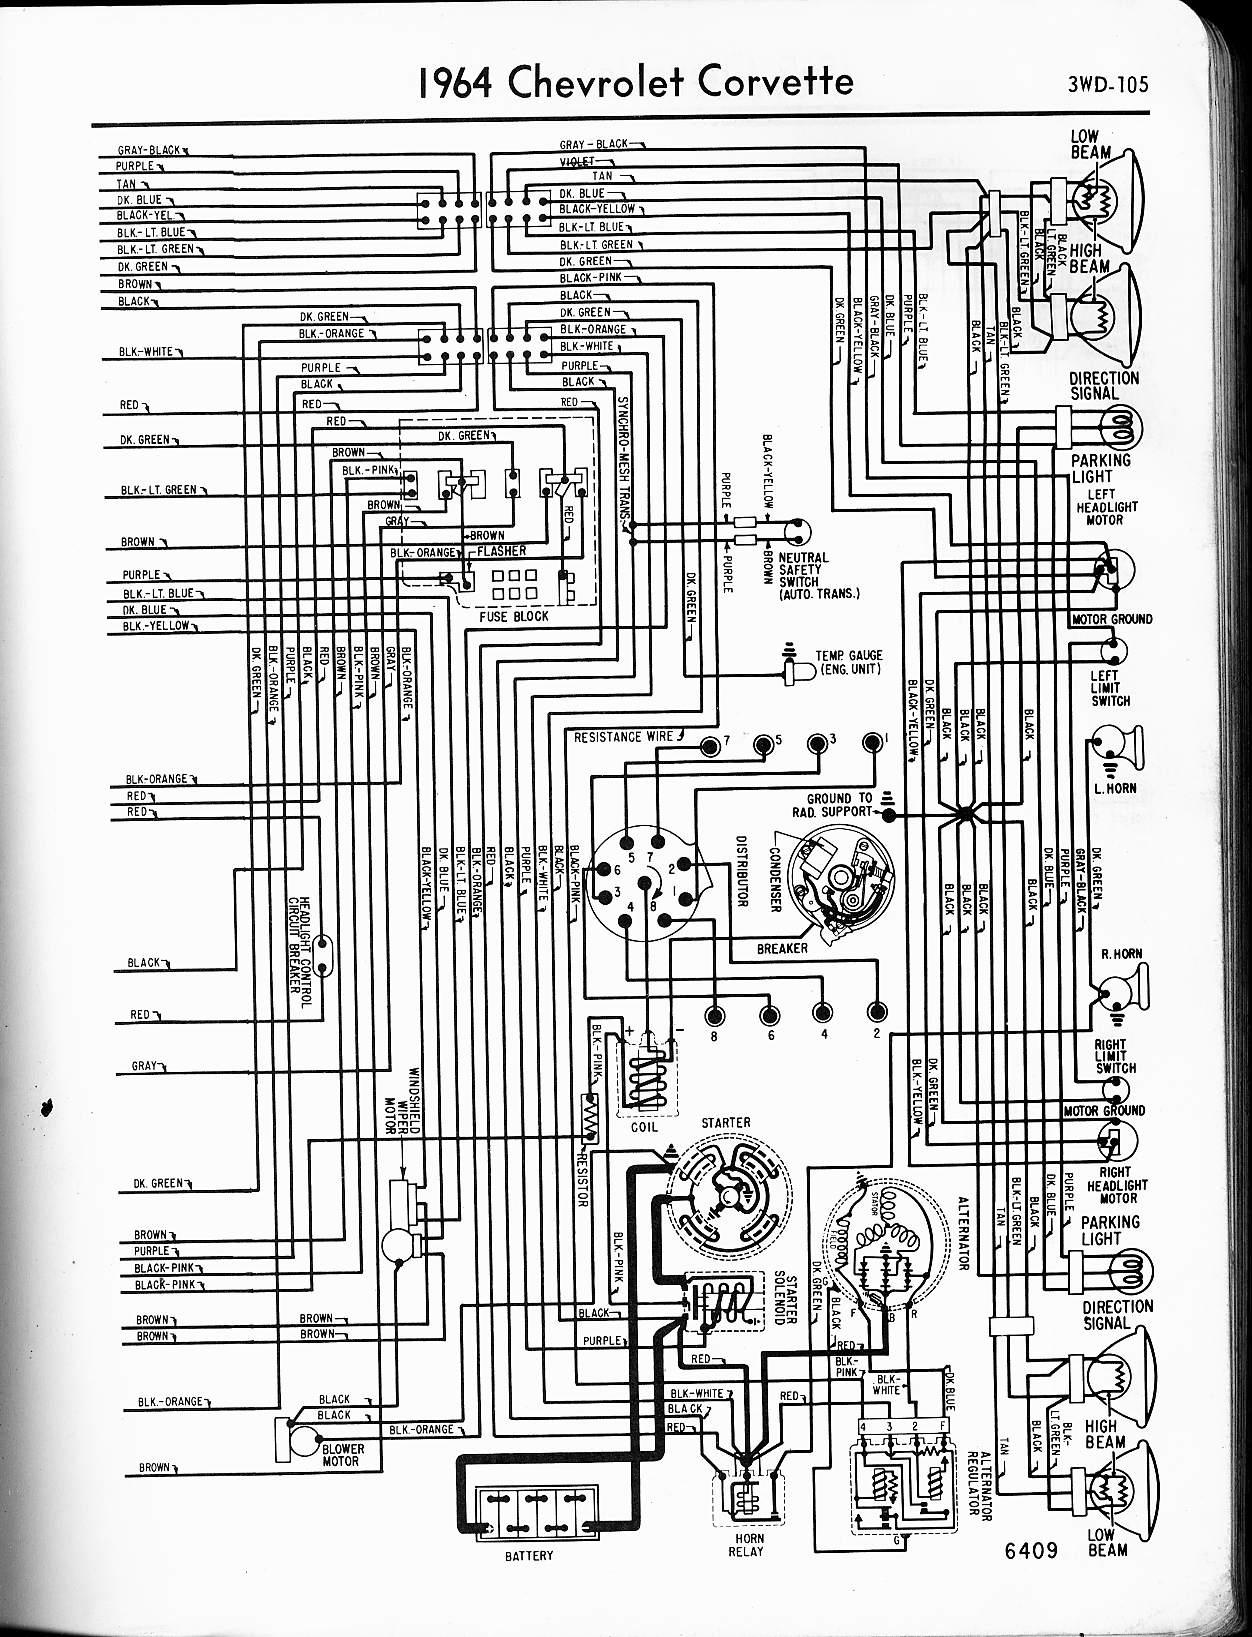 64 corvette headlight switch wiring diagram